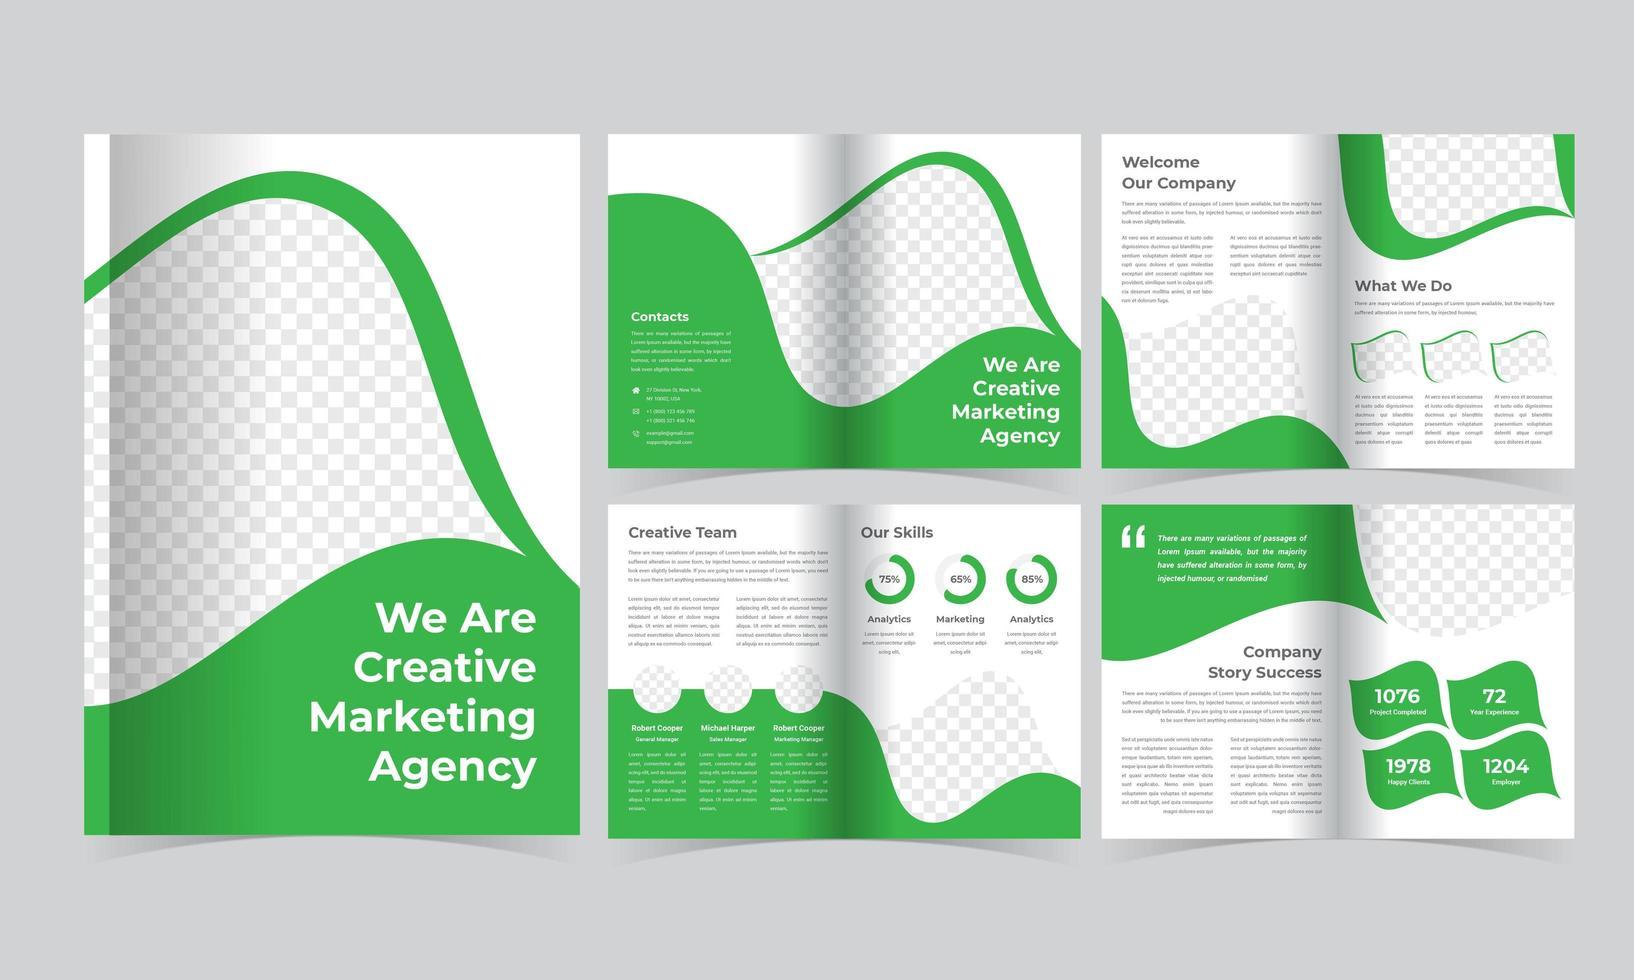 plantilla de folleto corporativo verde con detalles inclinados vector